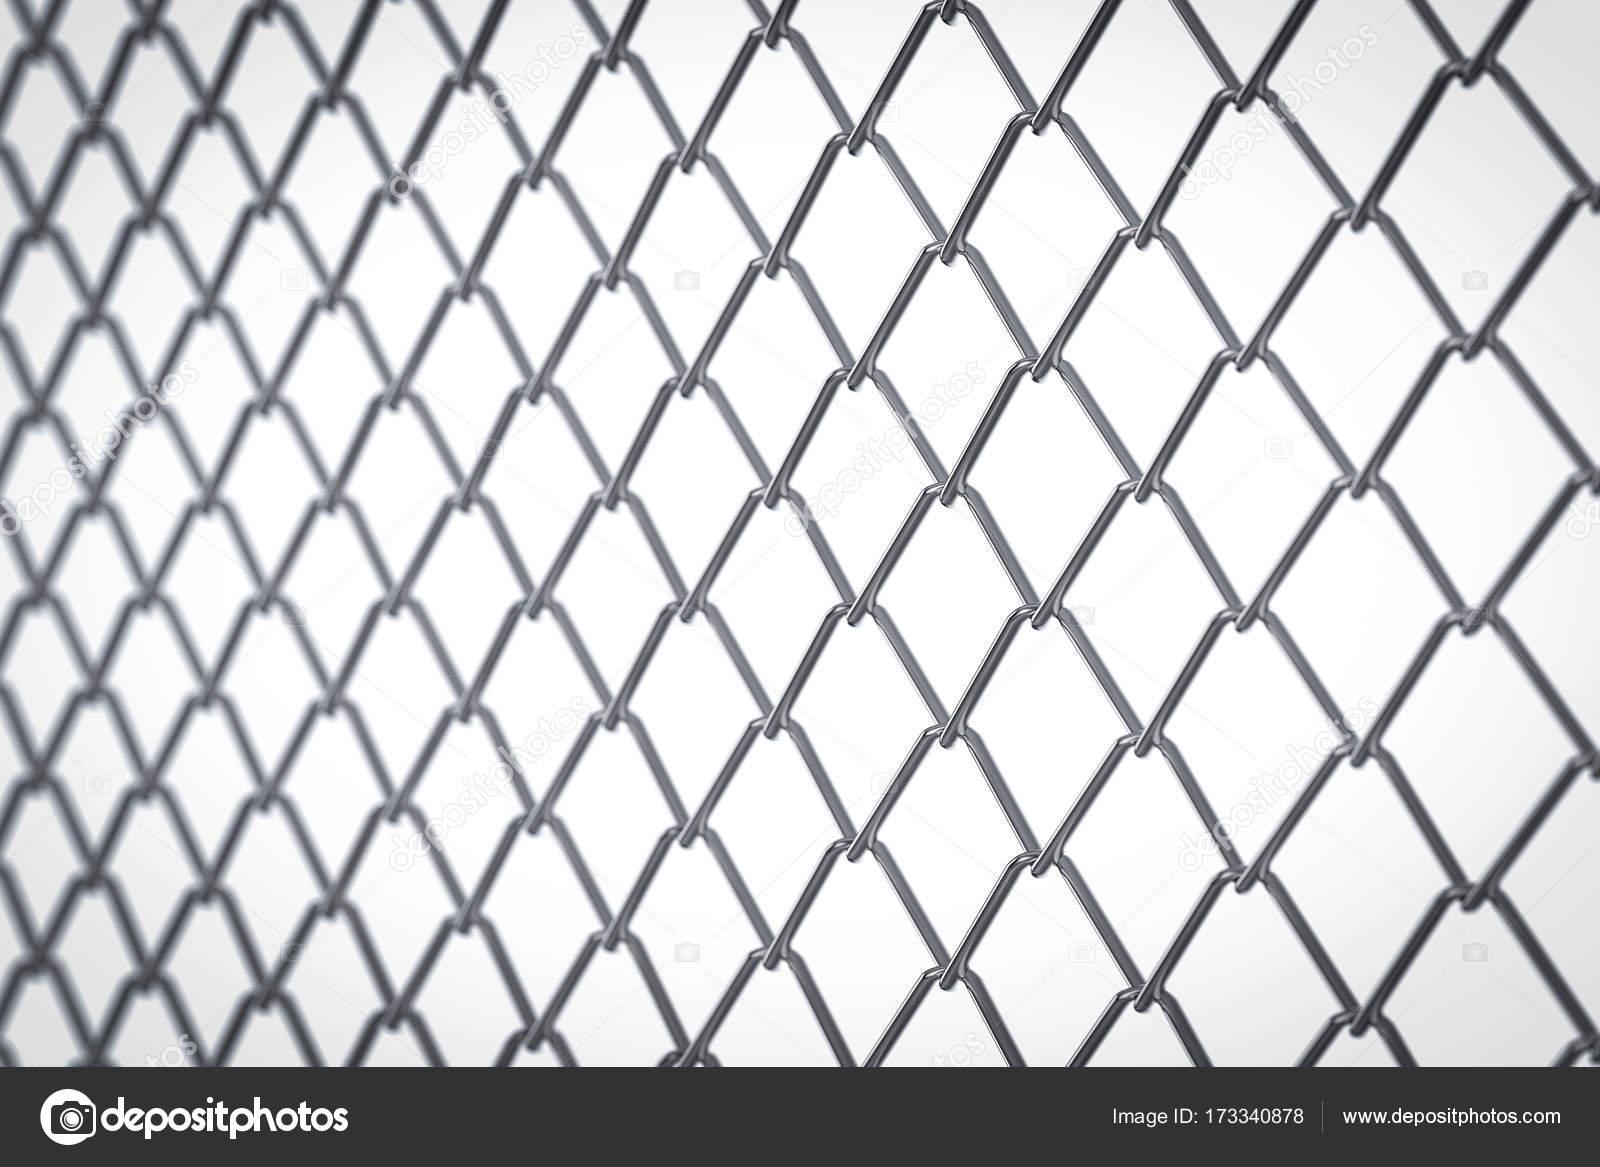 Maschendrahtzaun oder Kette Zaun — Stockfoto © phonlamai #173340878